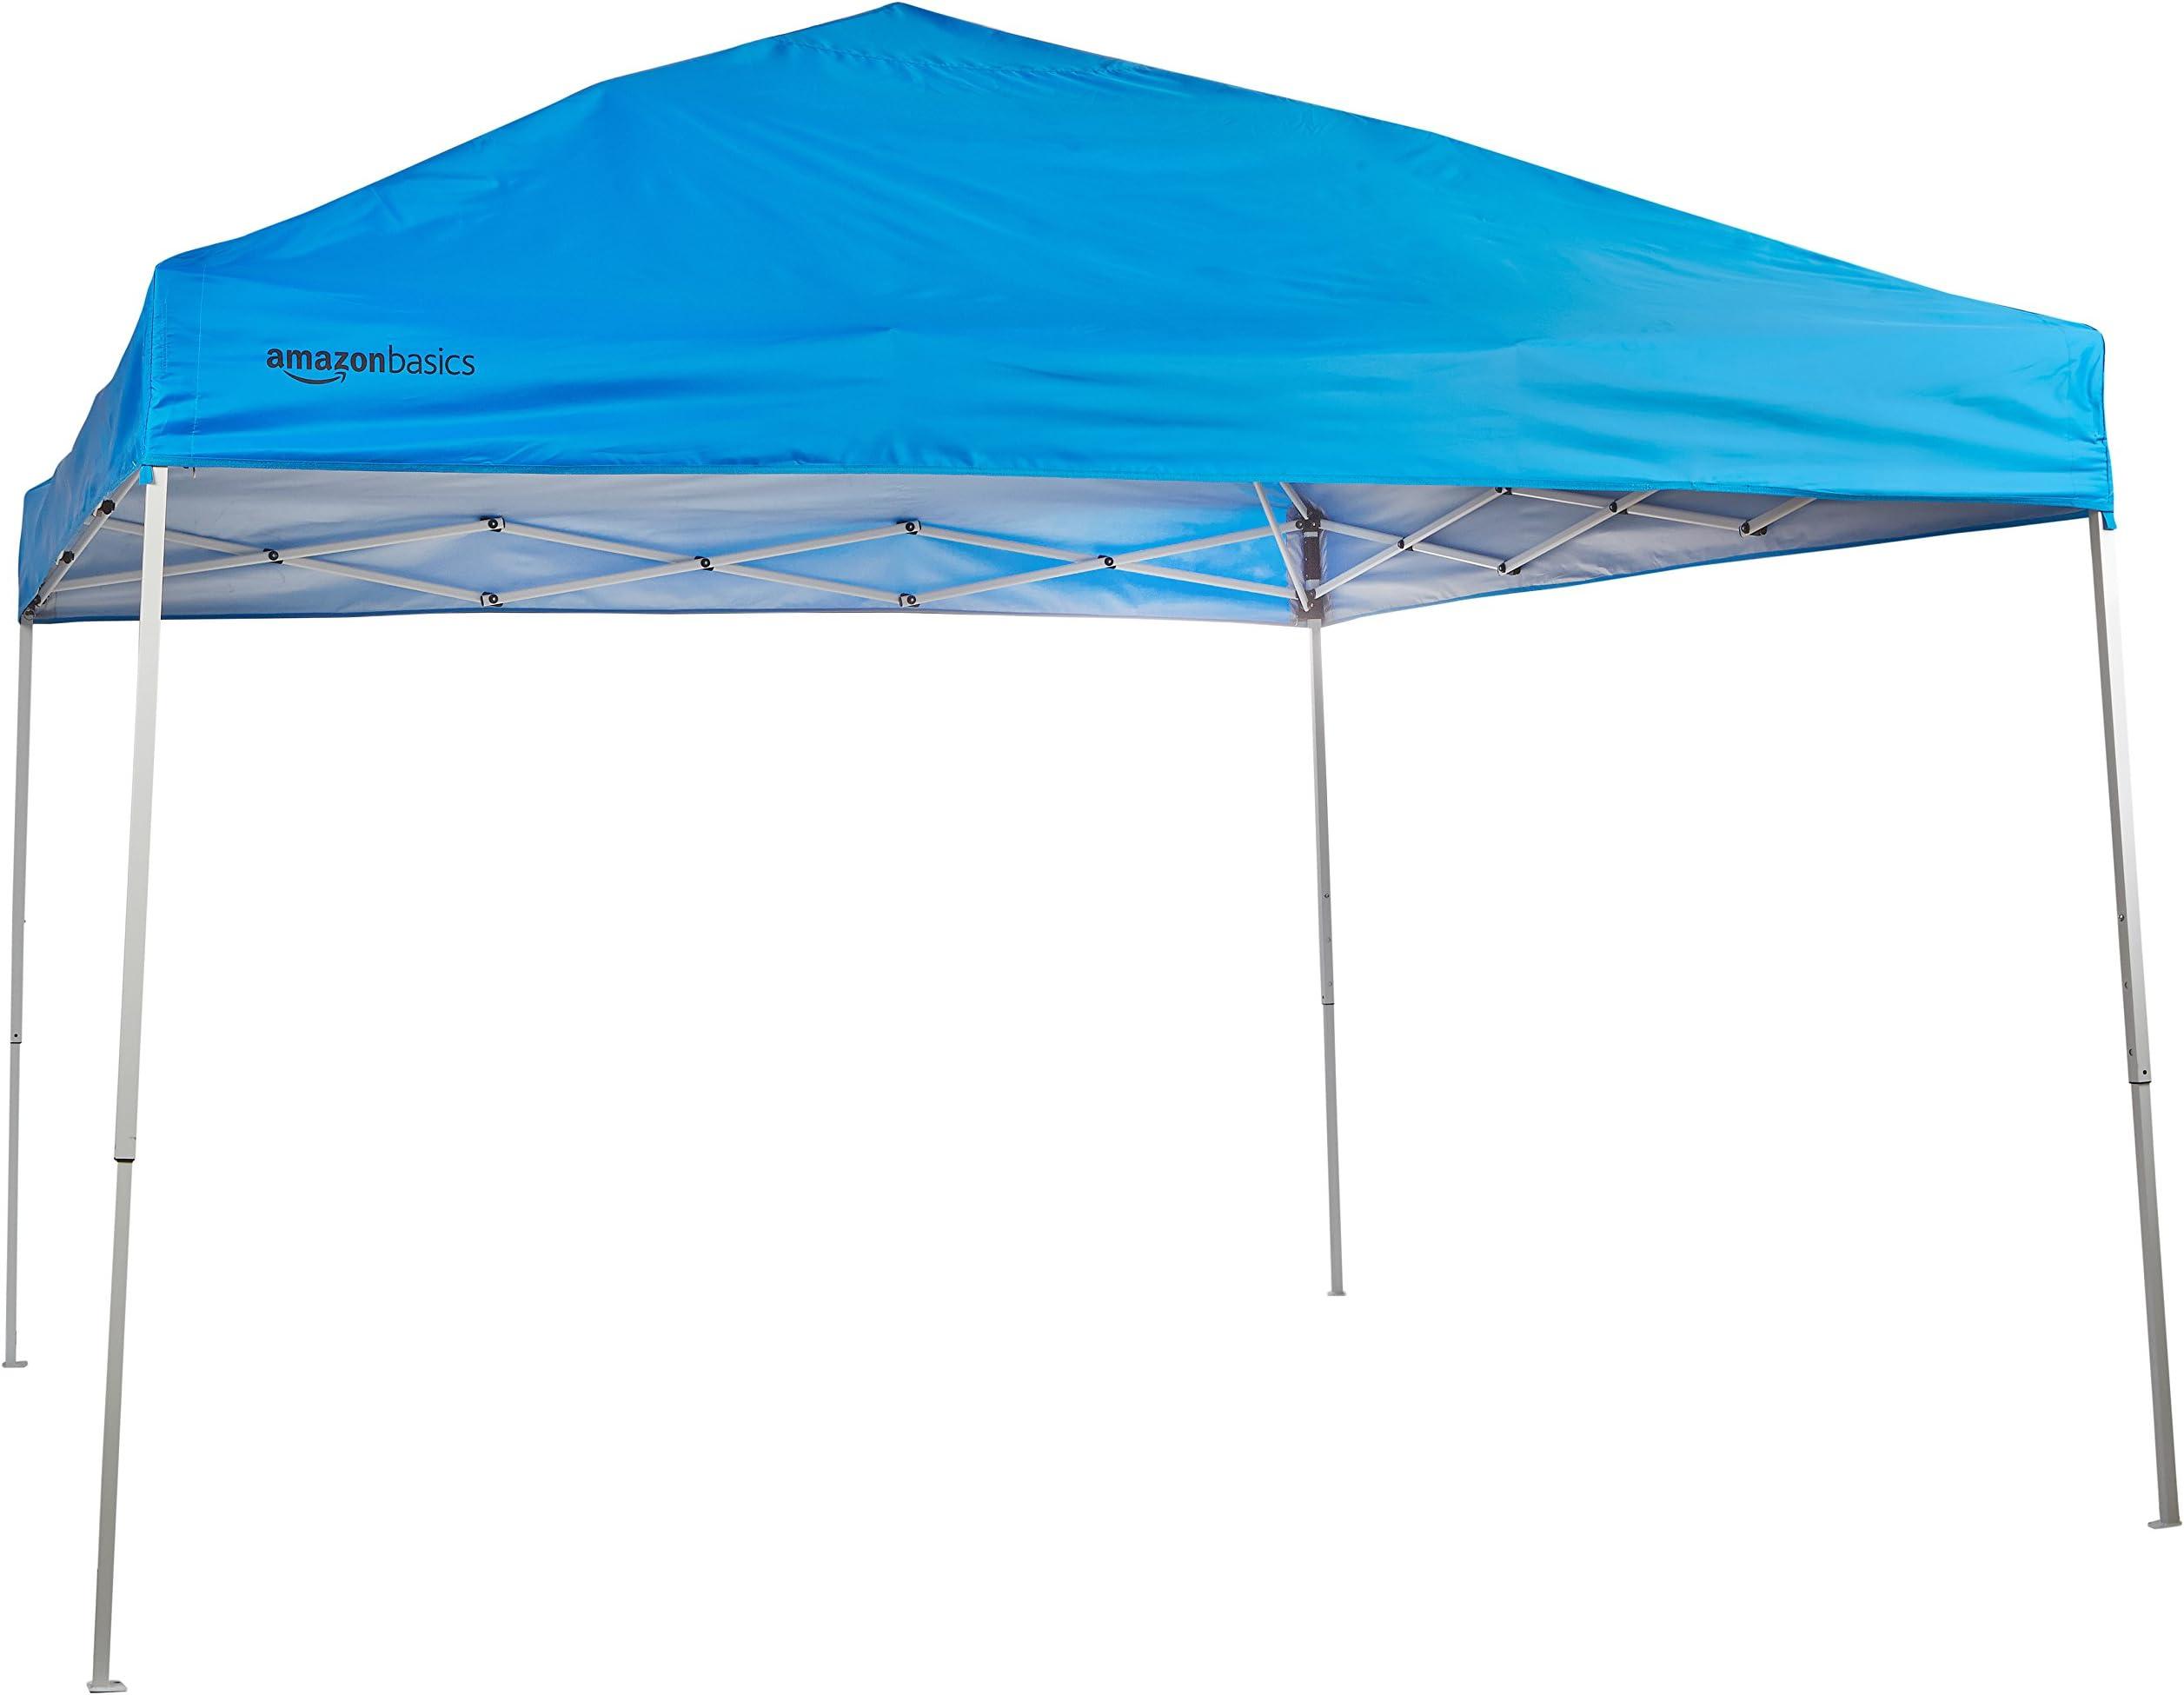 AmazonBasics Pop-Up Canopy Tent - 10u0027 x 10u0027 Blue  sc 1 st  Amazon.com & Amazon.com: Canopies - Canopies Gazebos u0026 Pergolas: Patio Lawn ...